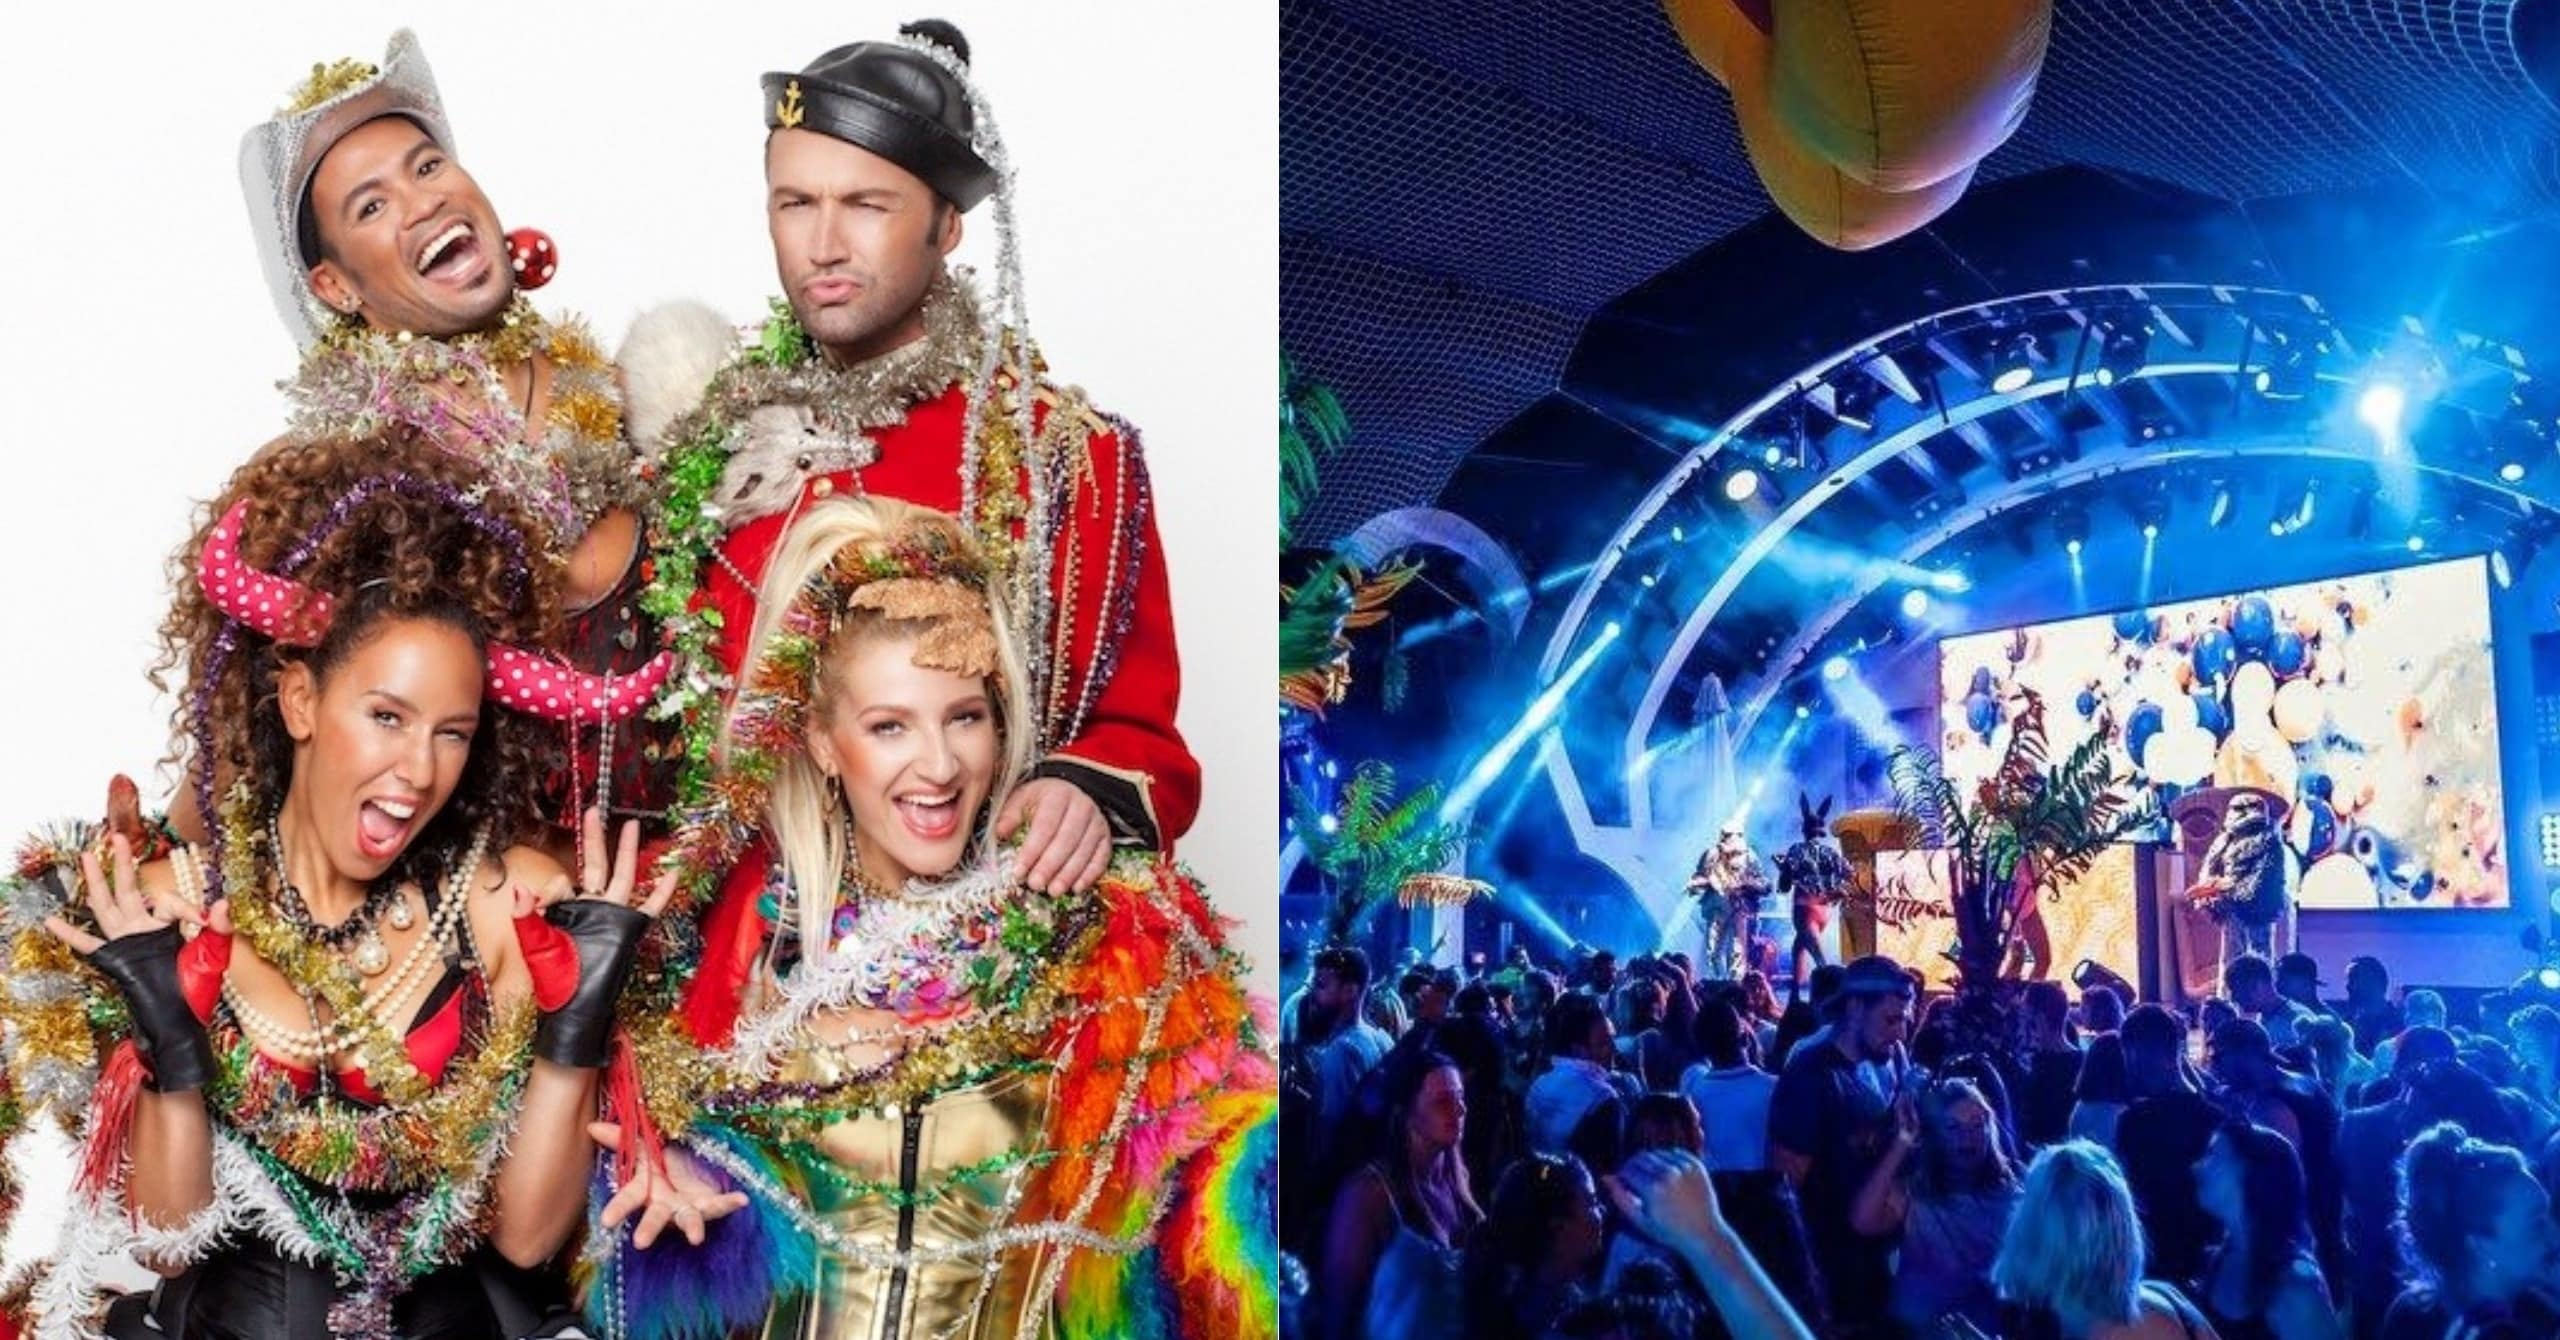 zero-gravity-dubai-vengaboys-dubai-music-festivals-in-dubai